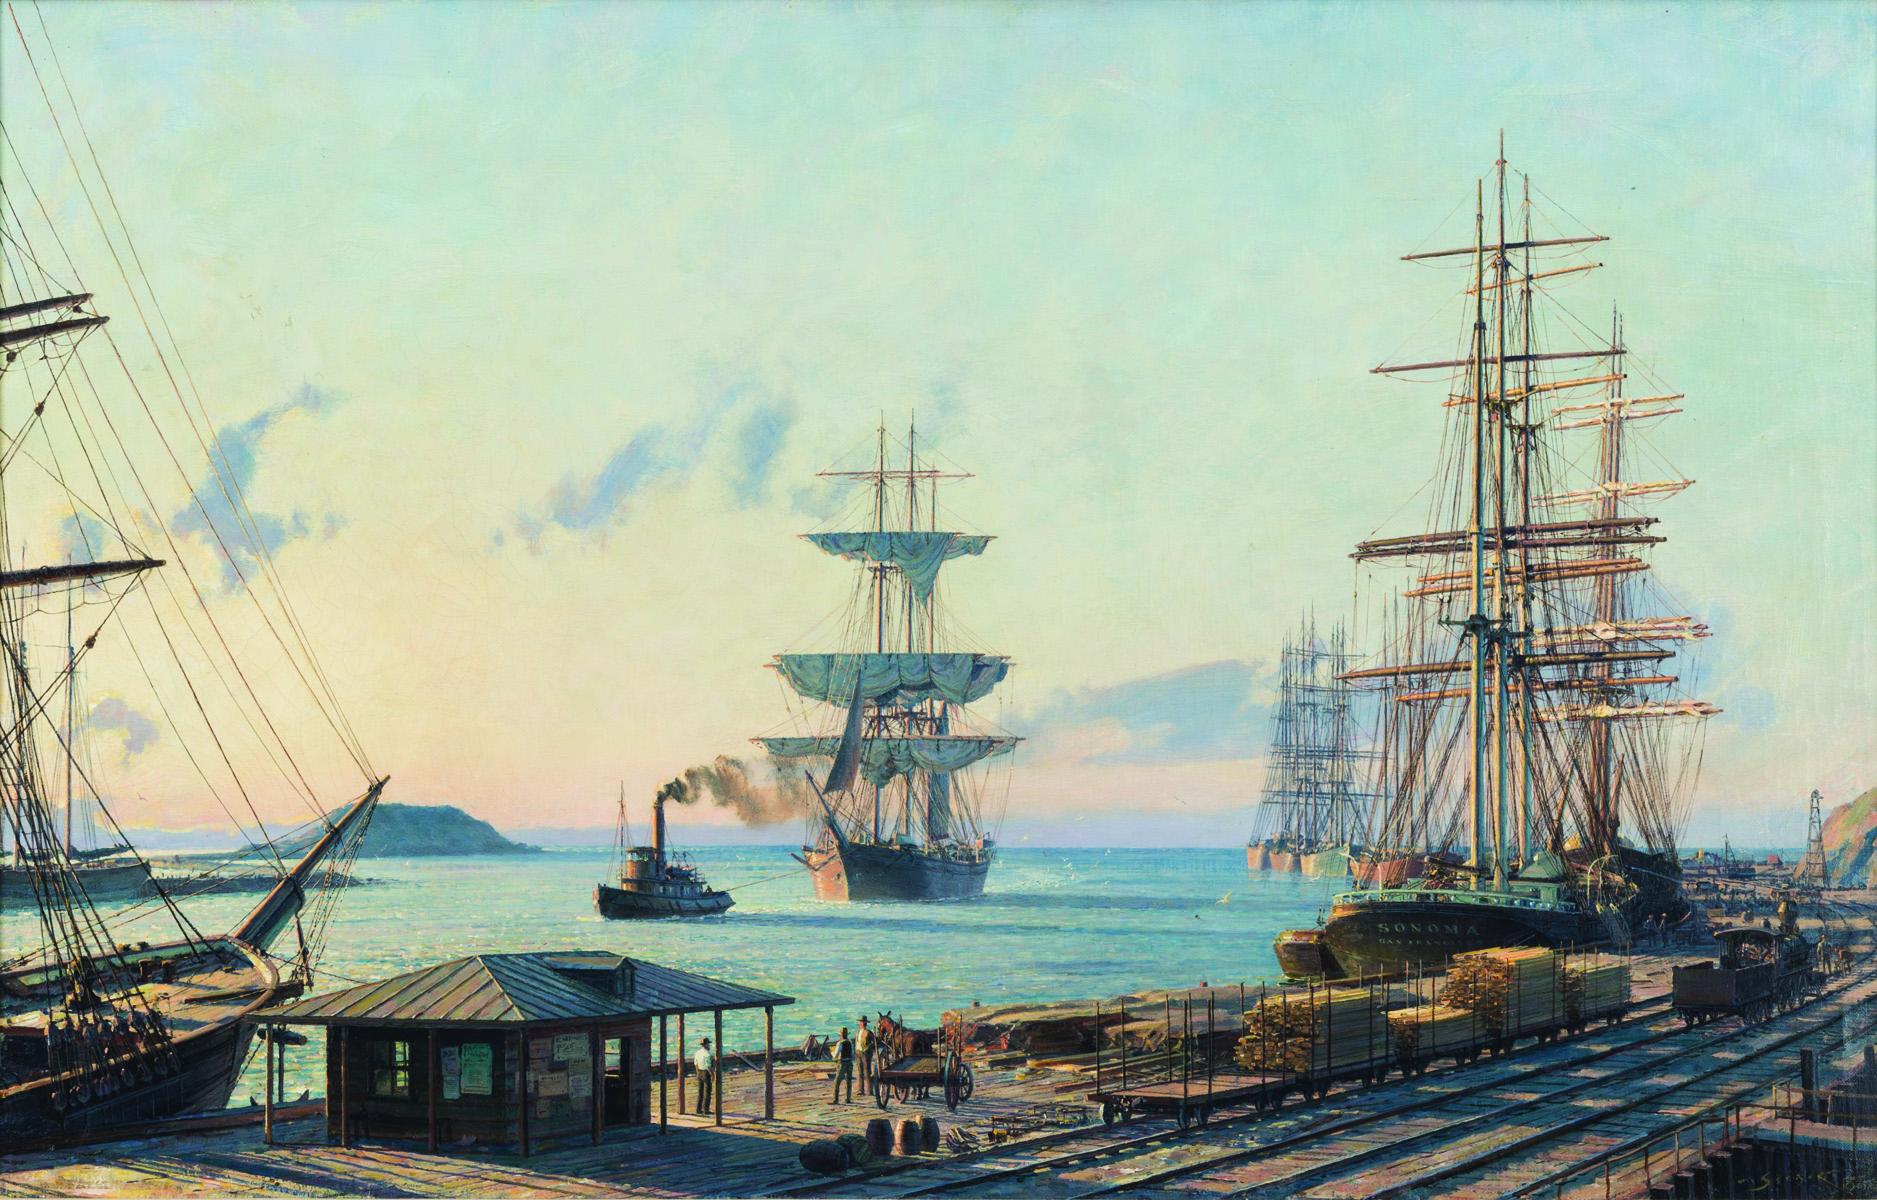 John Stobart,  San Pedro:  The Bark  Vidette  Towing into Port at Sunrise in 1890 , oil on canvas, 1983;  courtesy of Kensington Galleries.